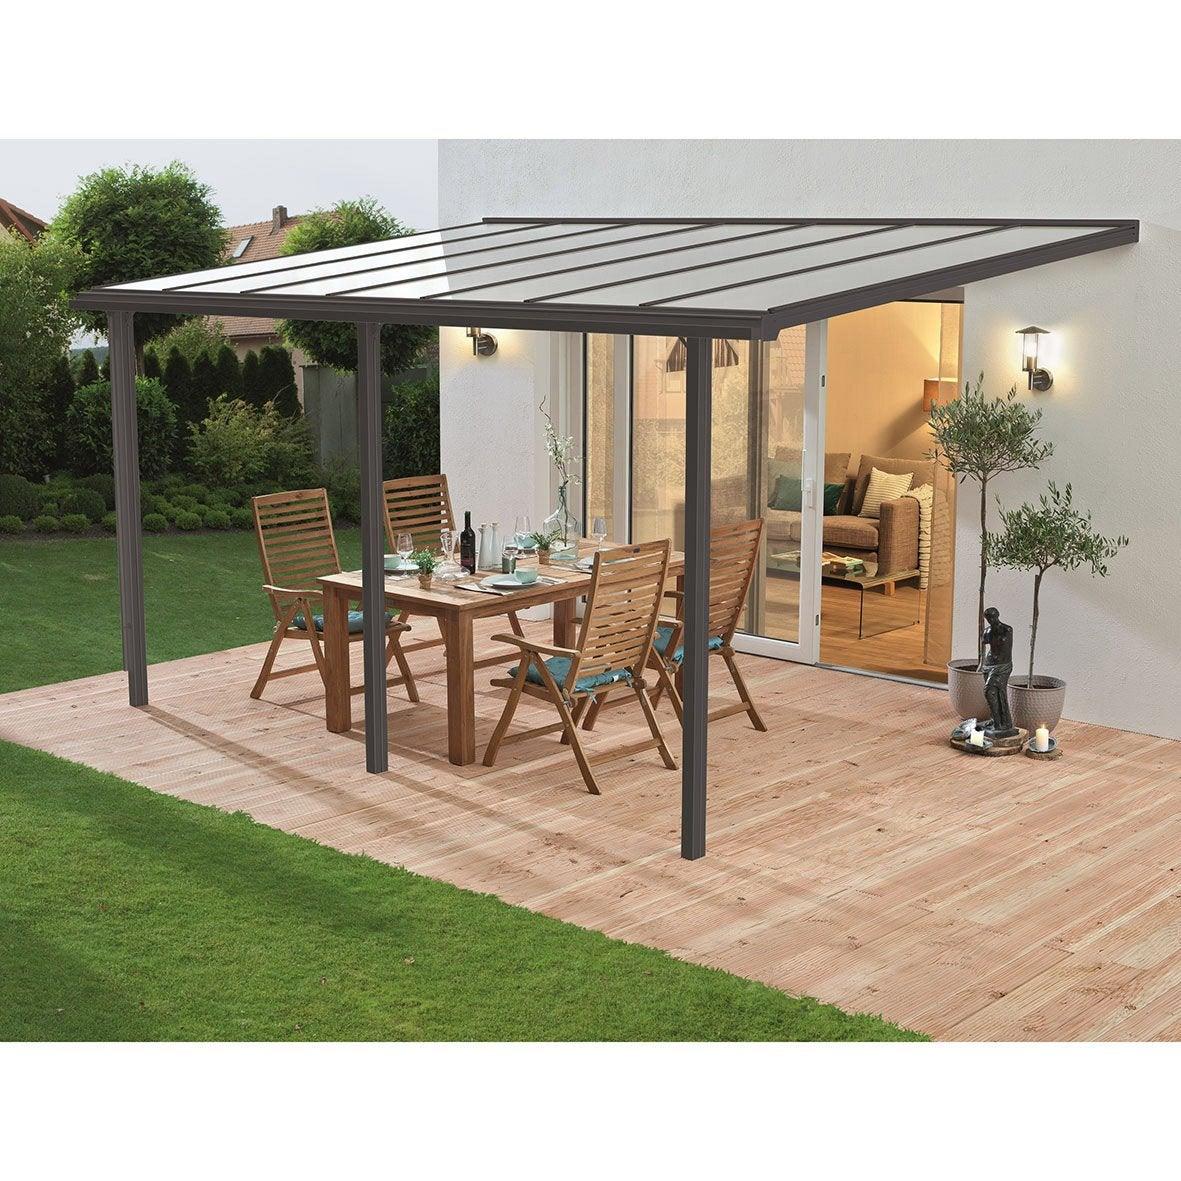 couverture de terrasse adoss e tradition aluminium gris 13 m leroy merlin. Black Bedroom Furniture Sets. Home Design Ideas